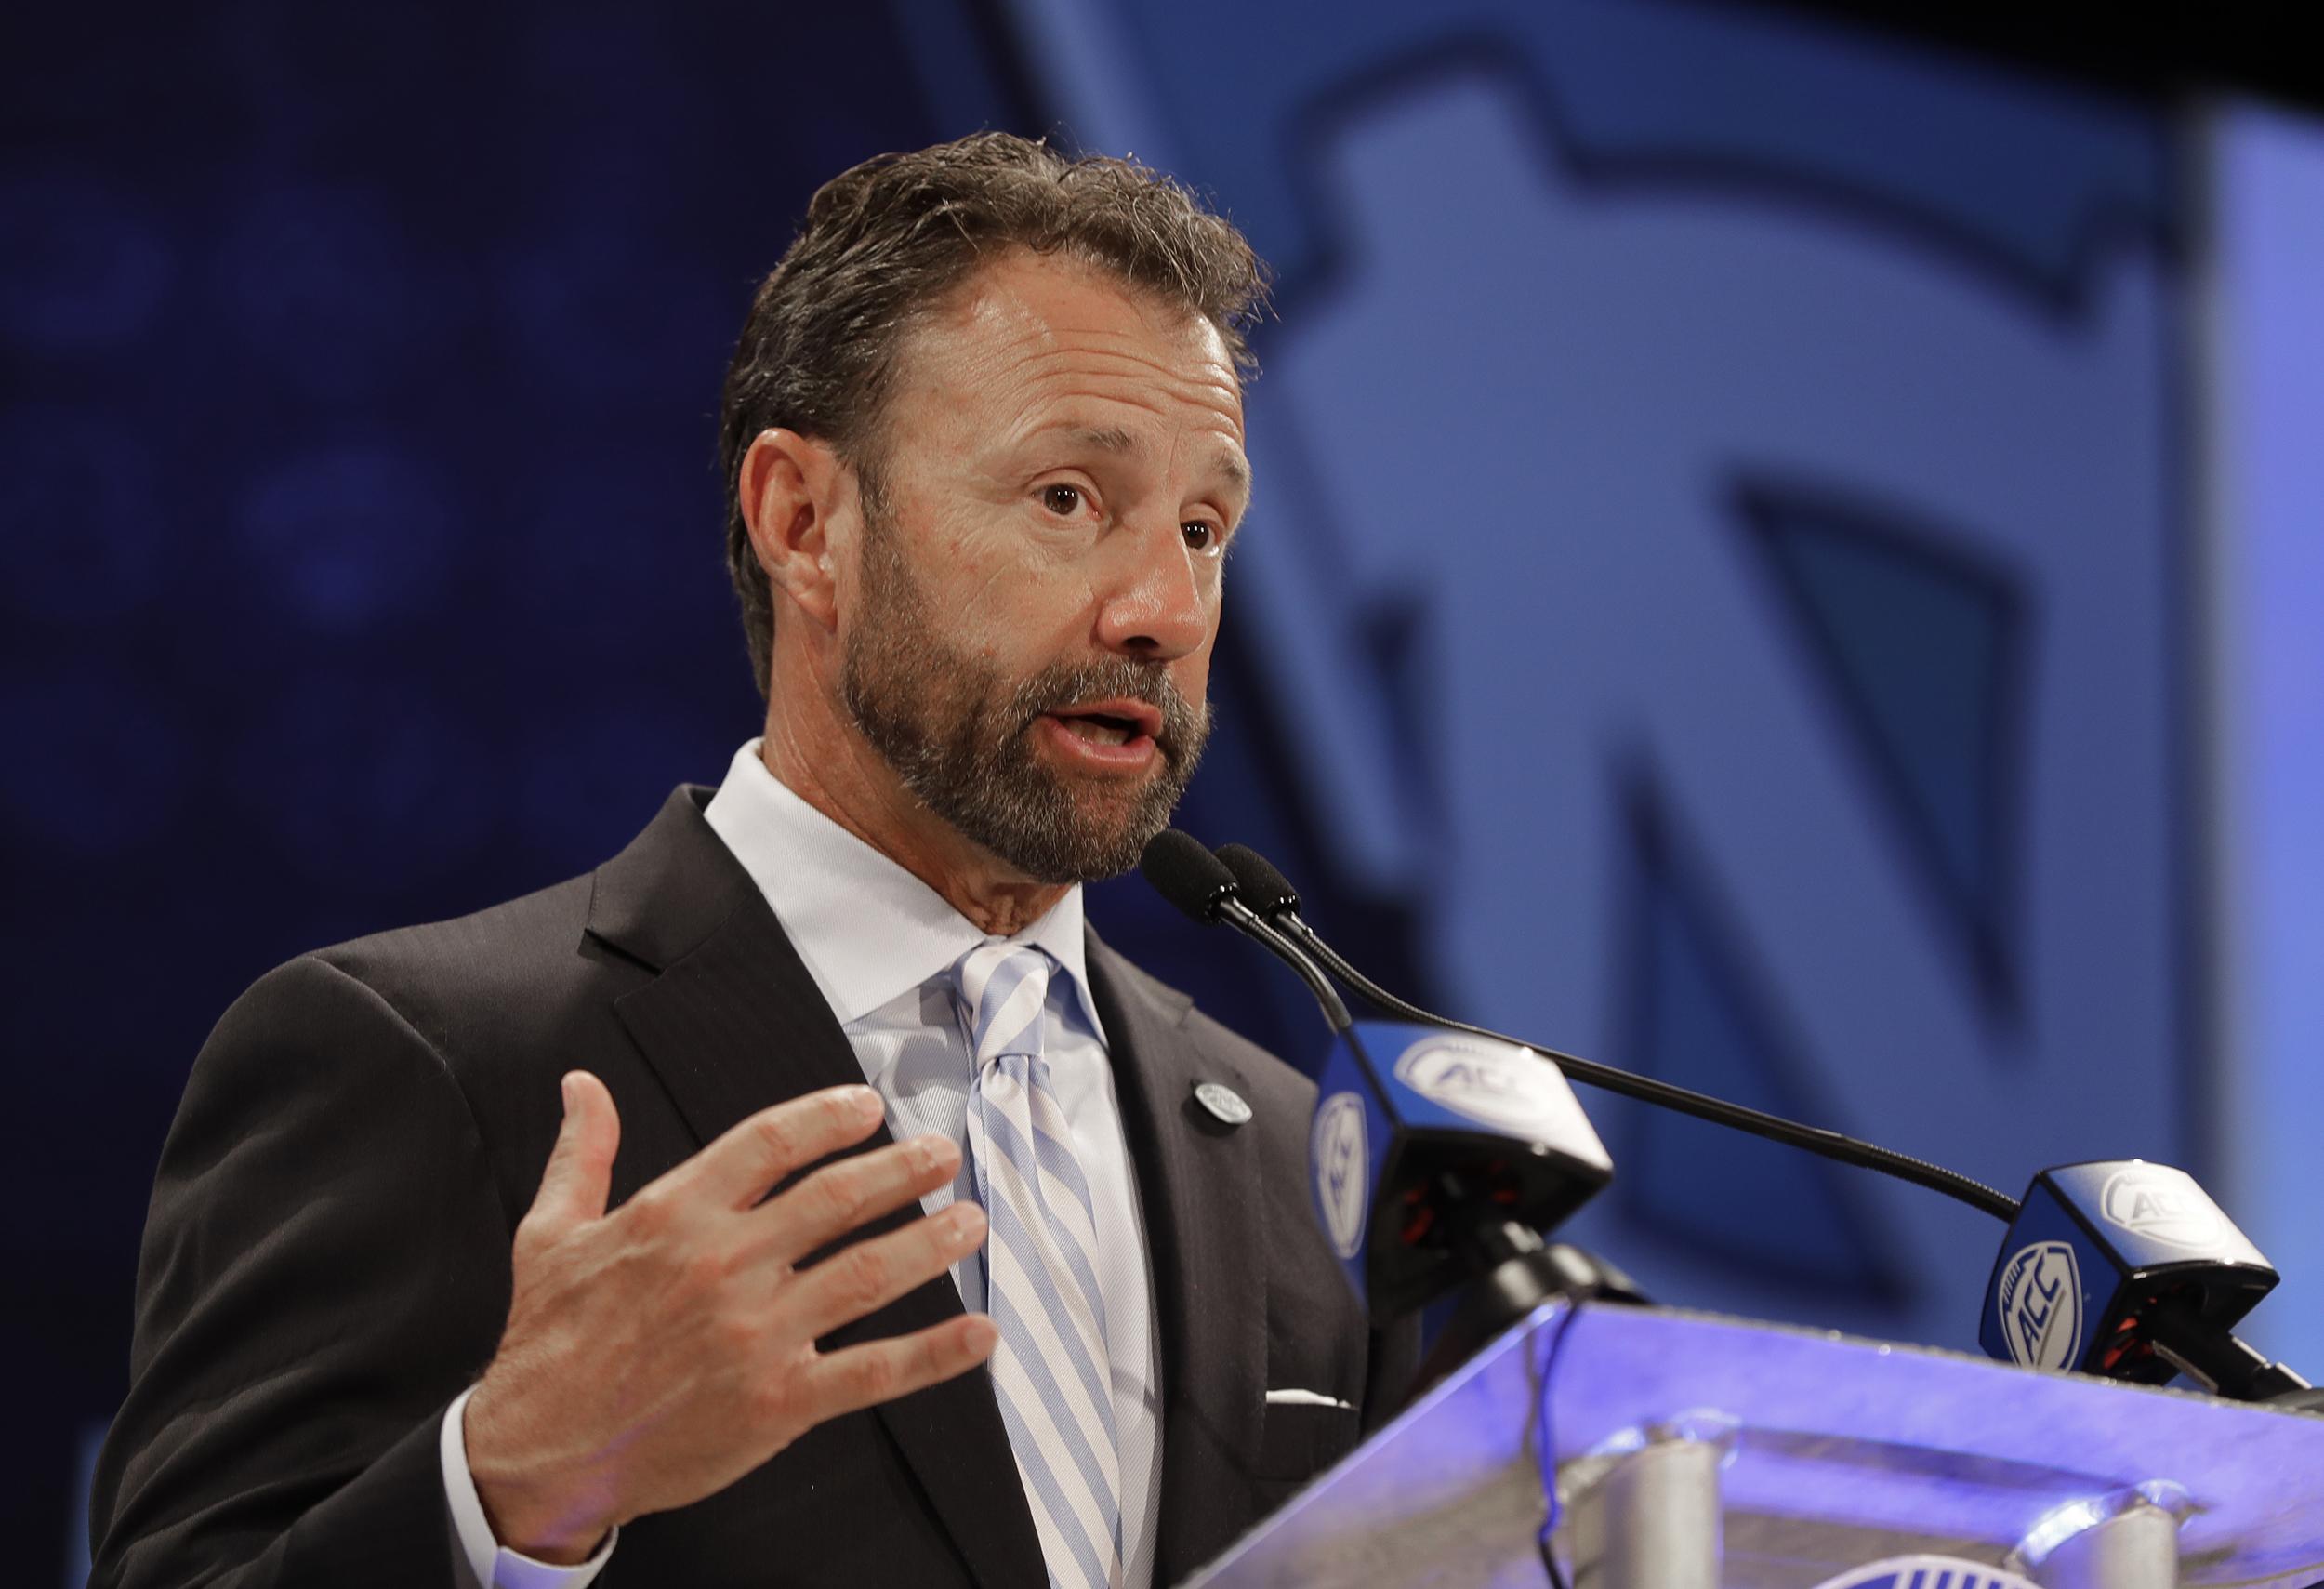 Despite evidence, skeptics try to cast doubt on CTE-football link